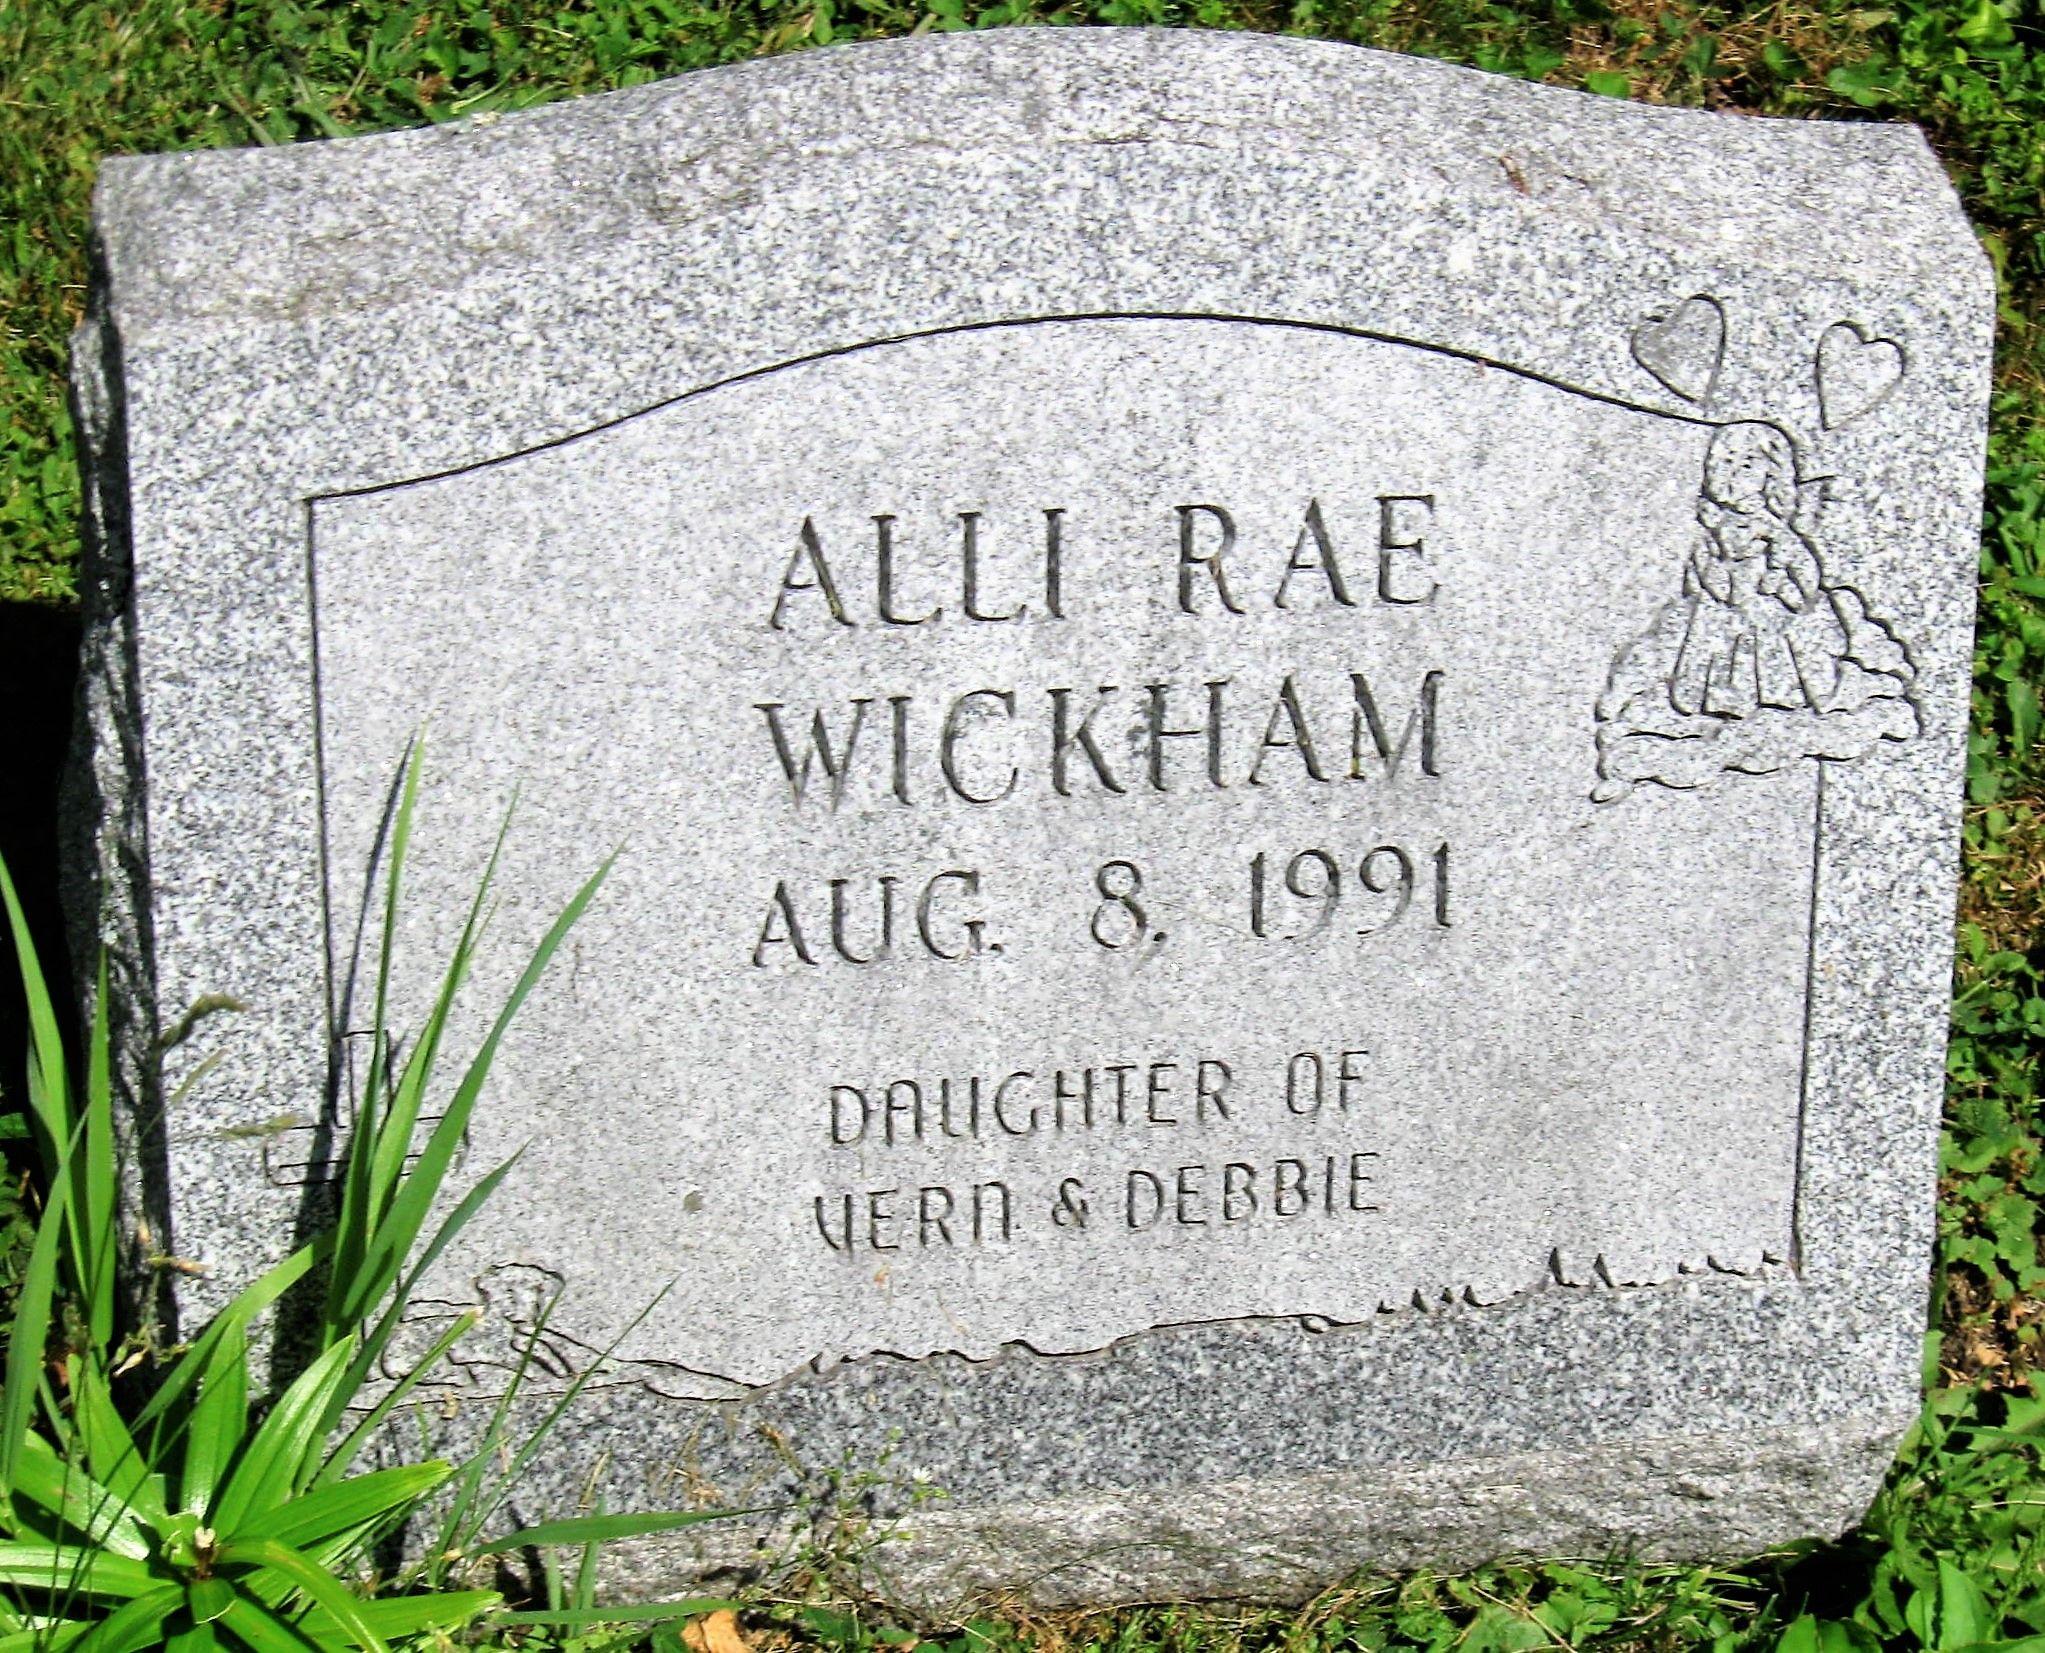 Alli Rae Photos alli rae wickham (unknown-1991) - find a grave memorial